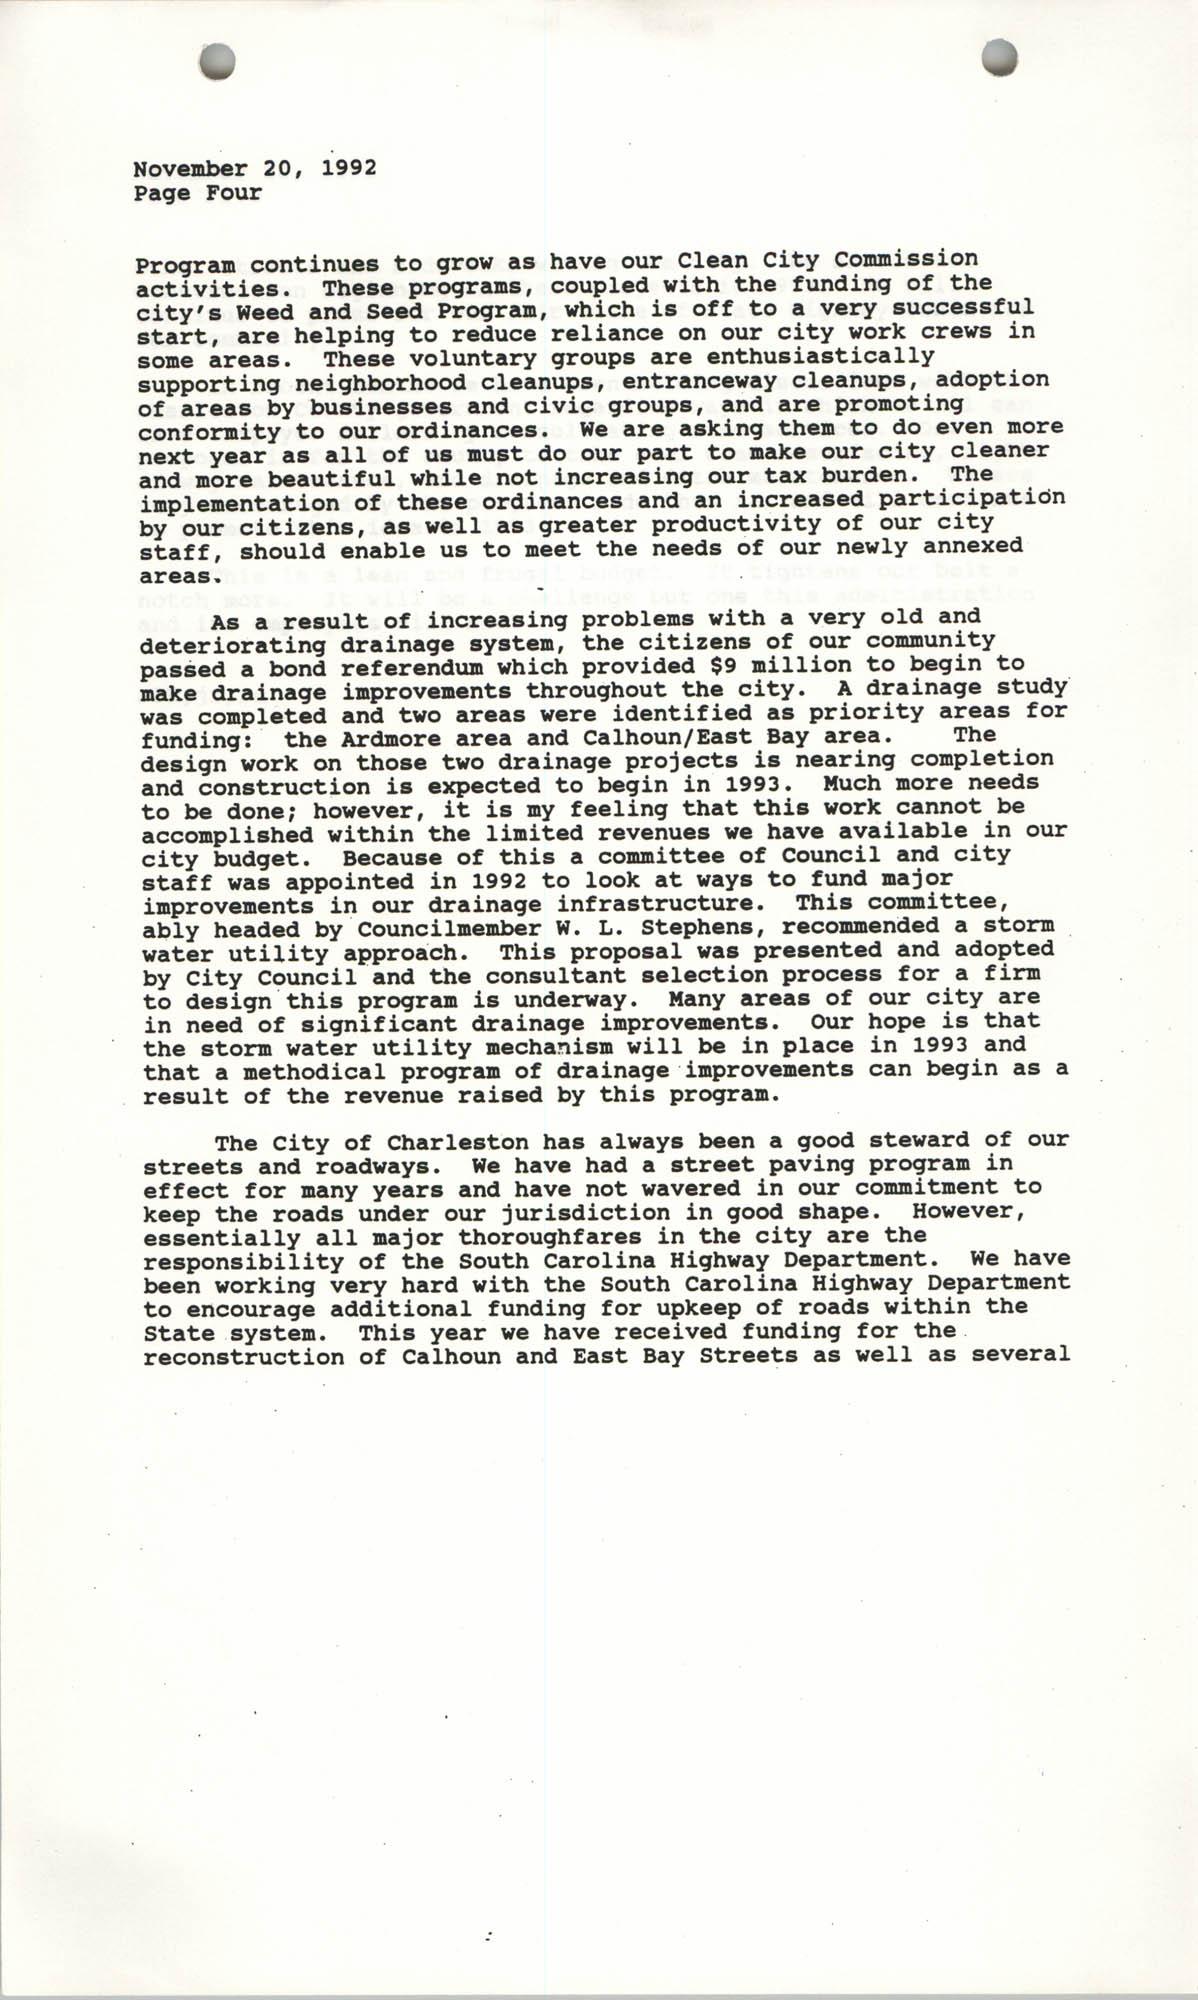 The City Council of Charleston, South Carolina, 1993 Budget, Page 4